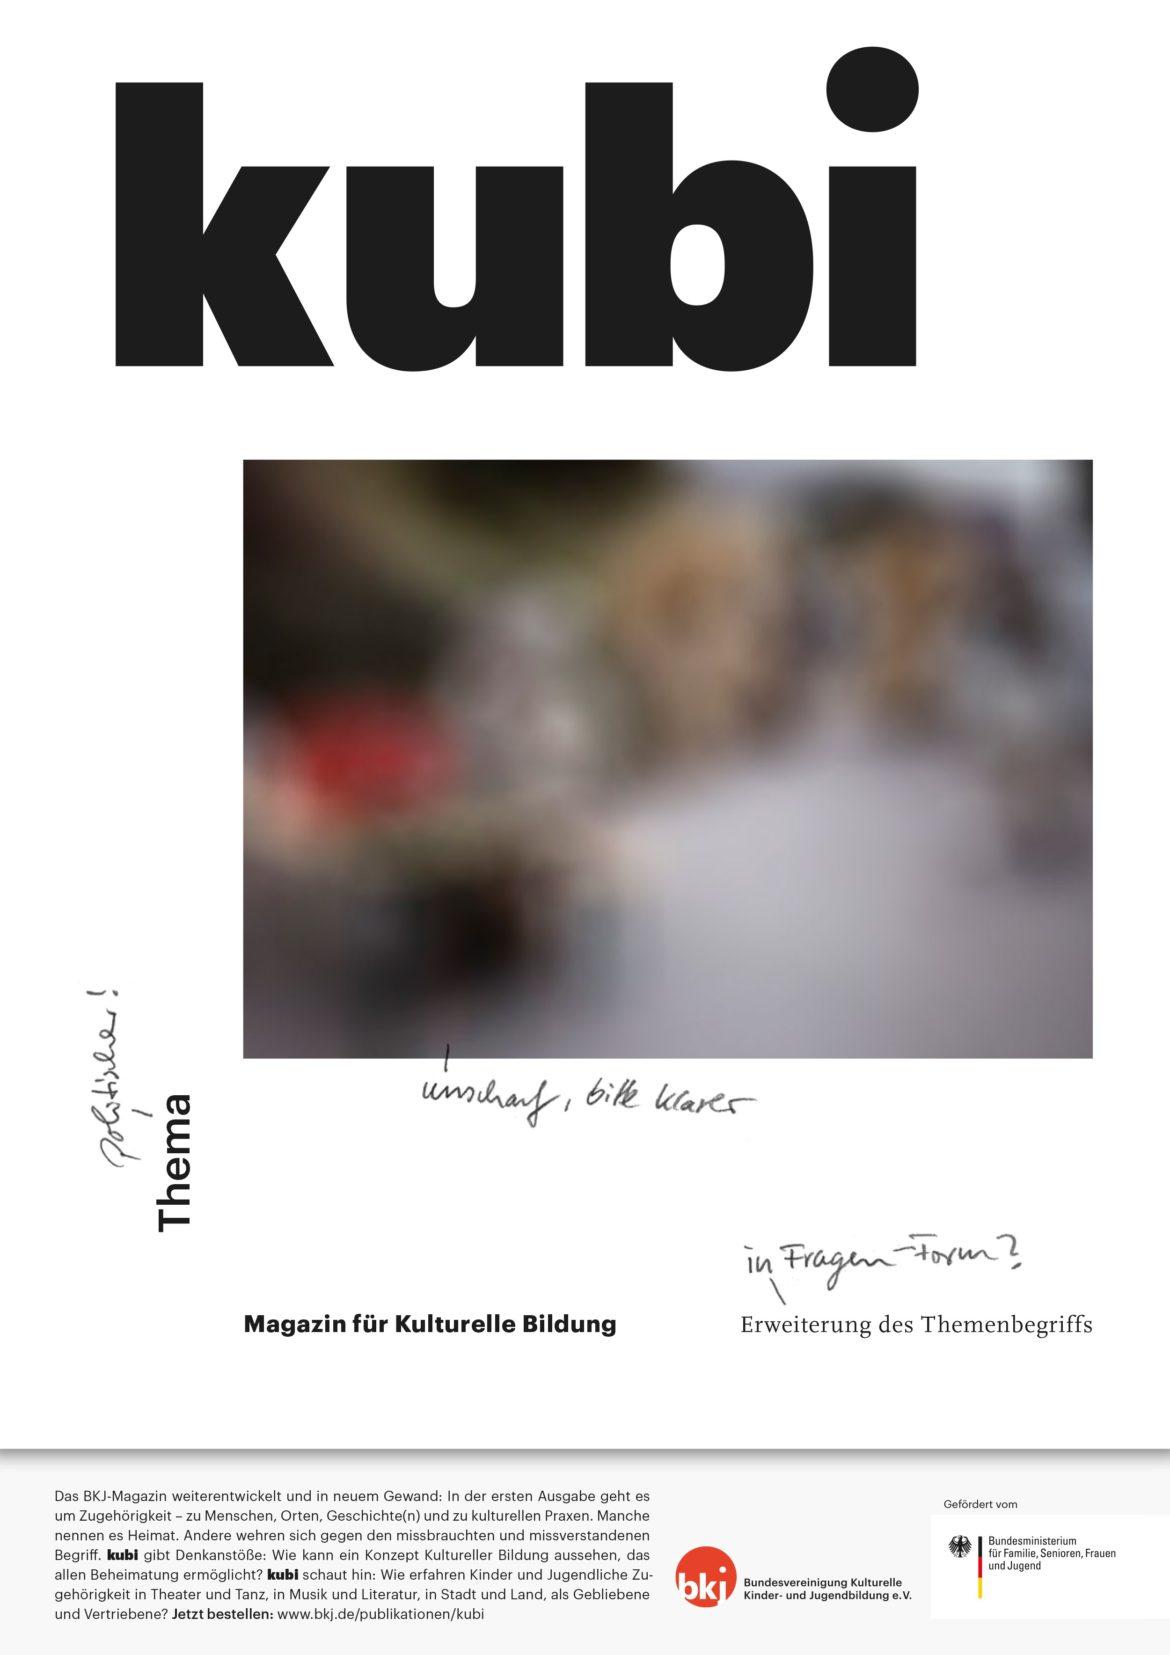 Cover | Titel | Magazin | Handschrift | Umwelt | kulturelle Bildung